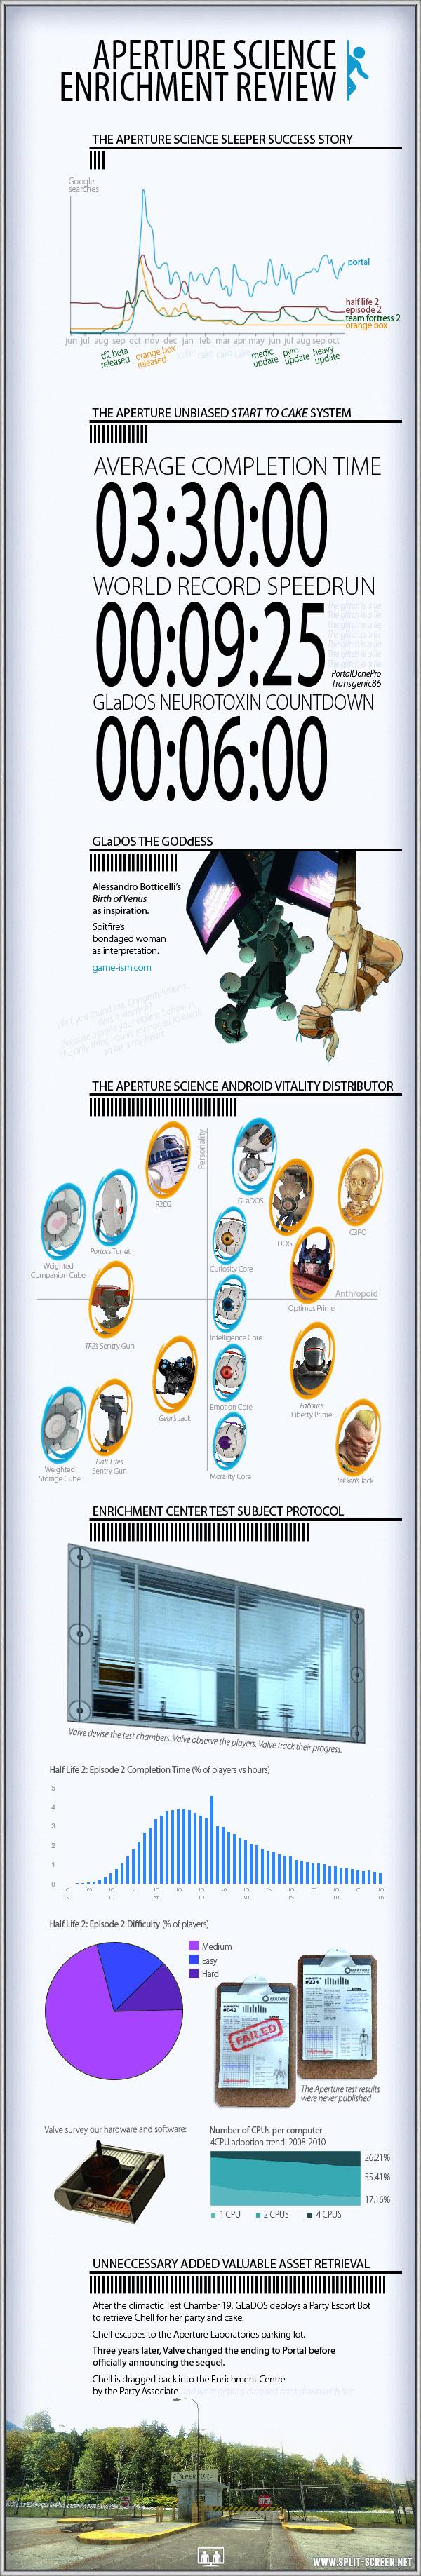 Portal Infographic 2